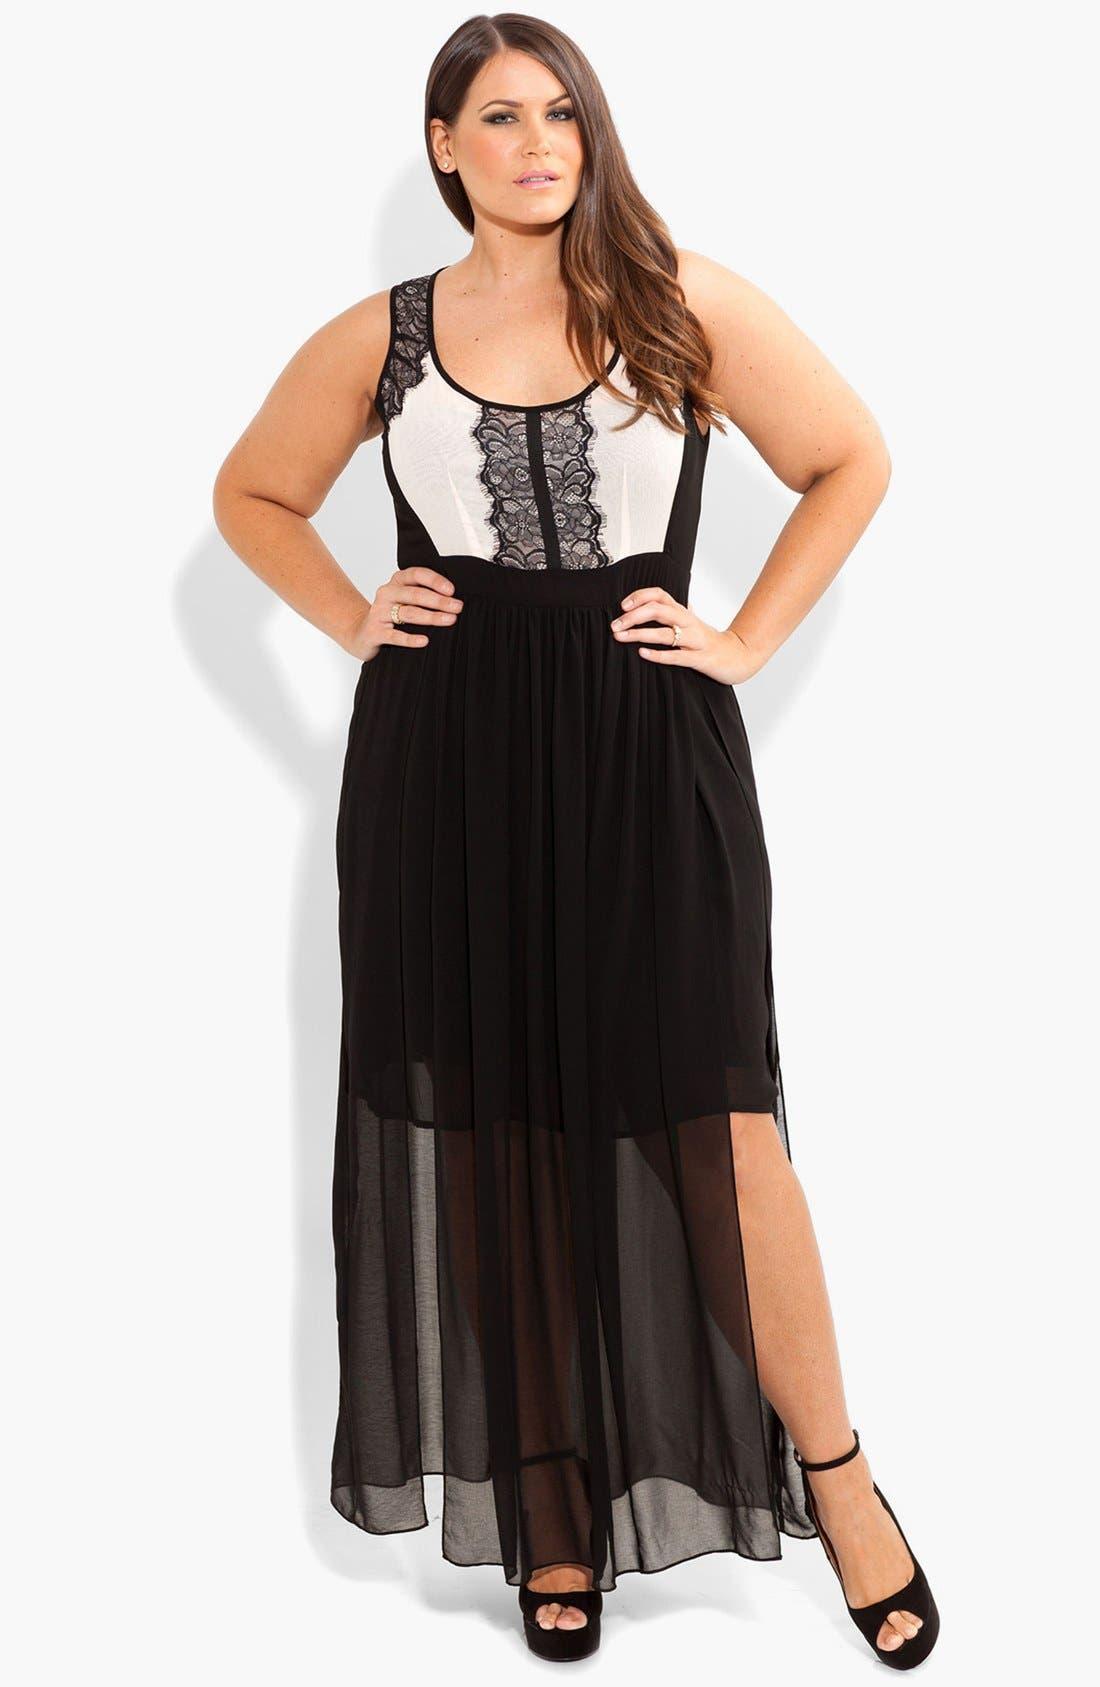 Alternate Image 1 Selected - City Chic 'Sheer Romantic' Maxi Dress (Plus Size)